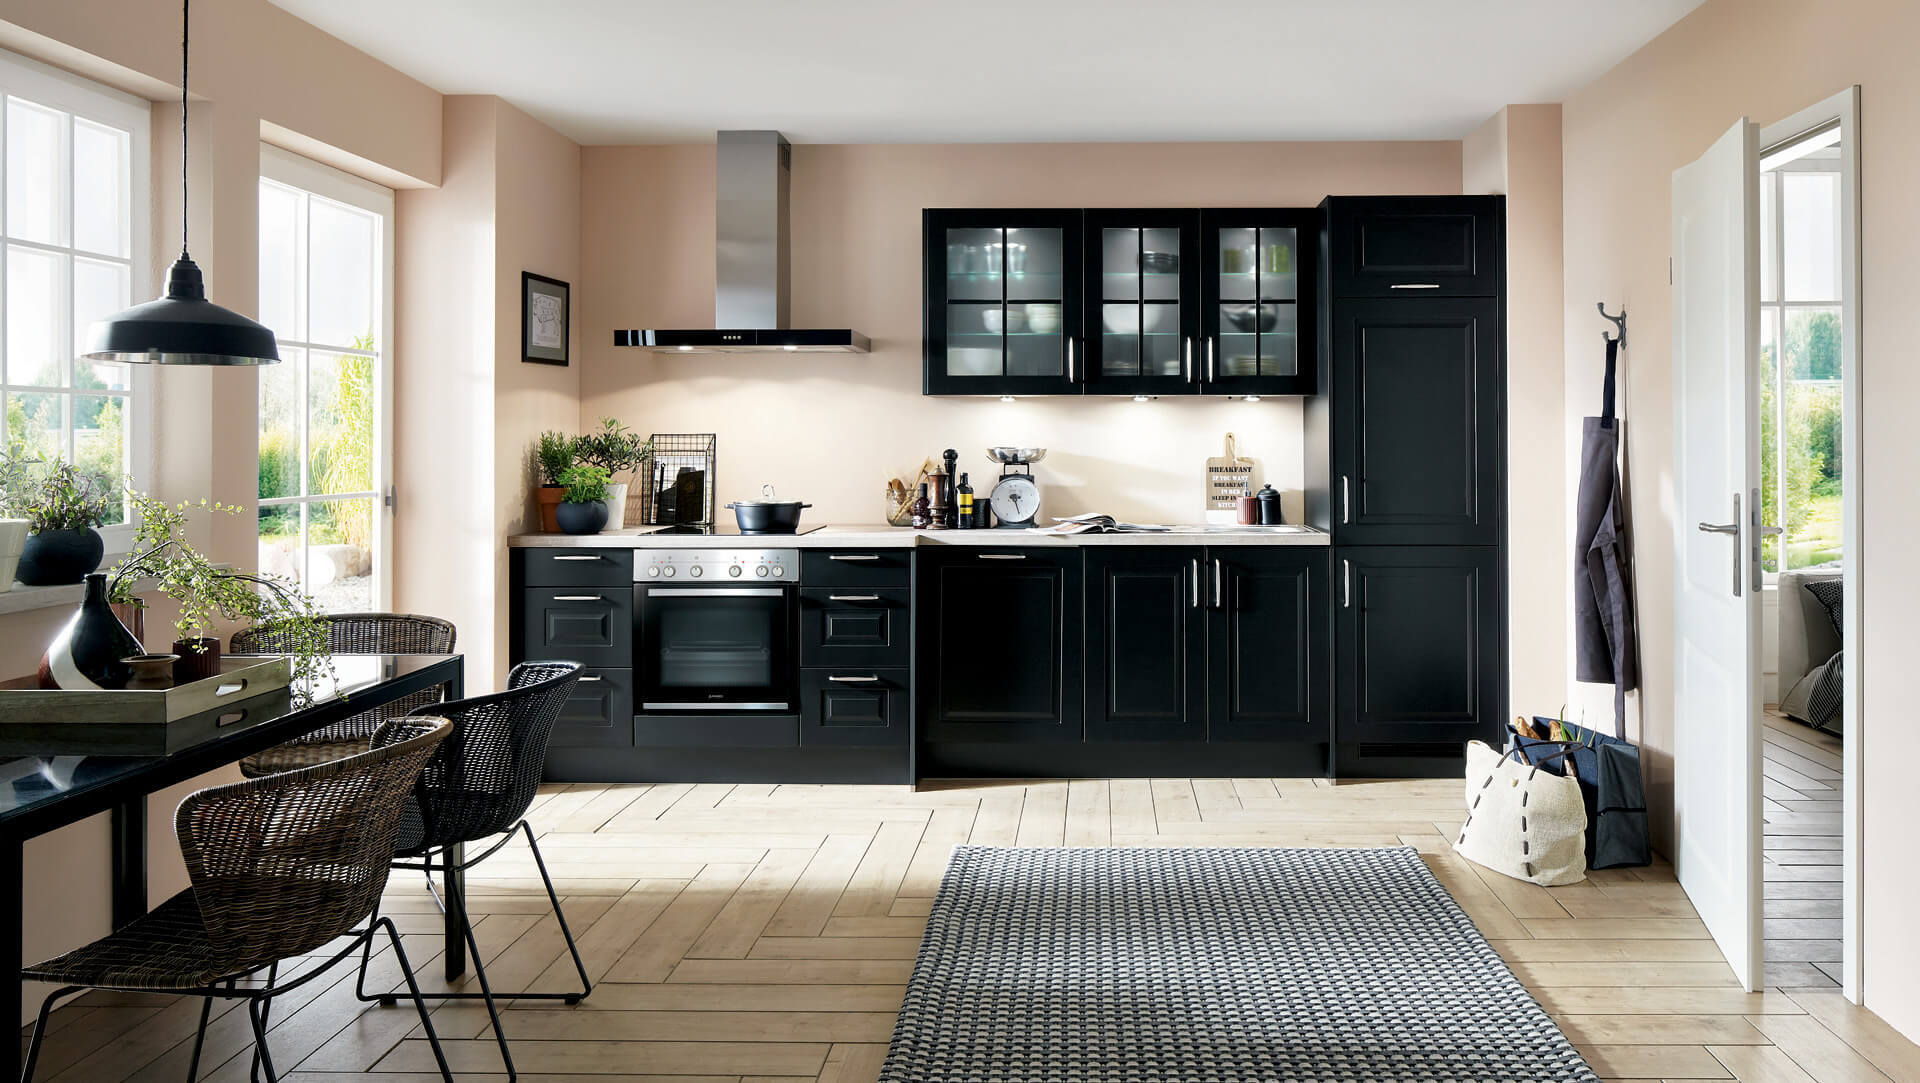 sylt - noir mat - envia cuisines